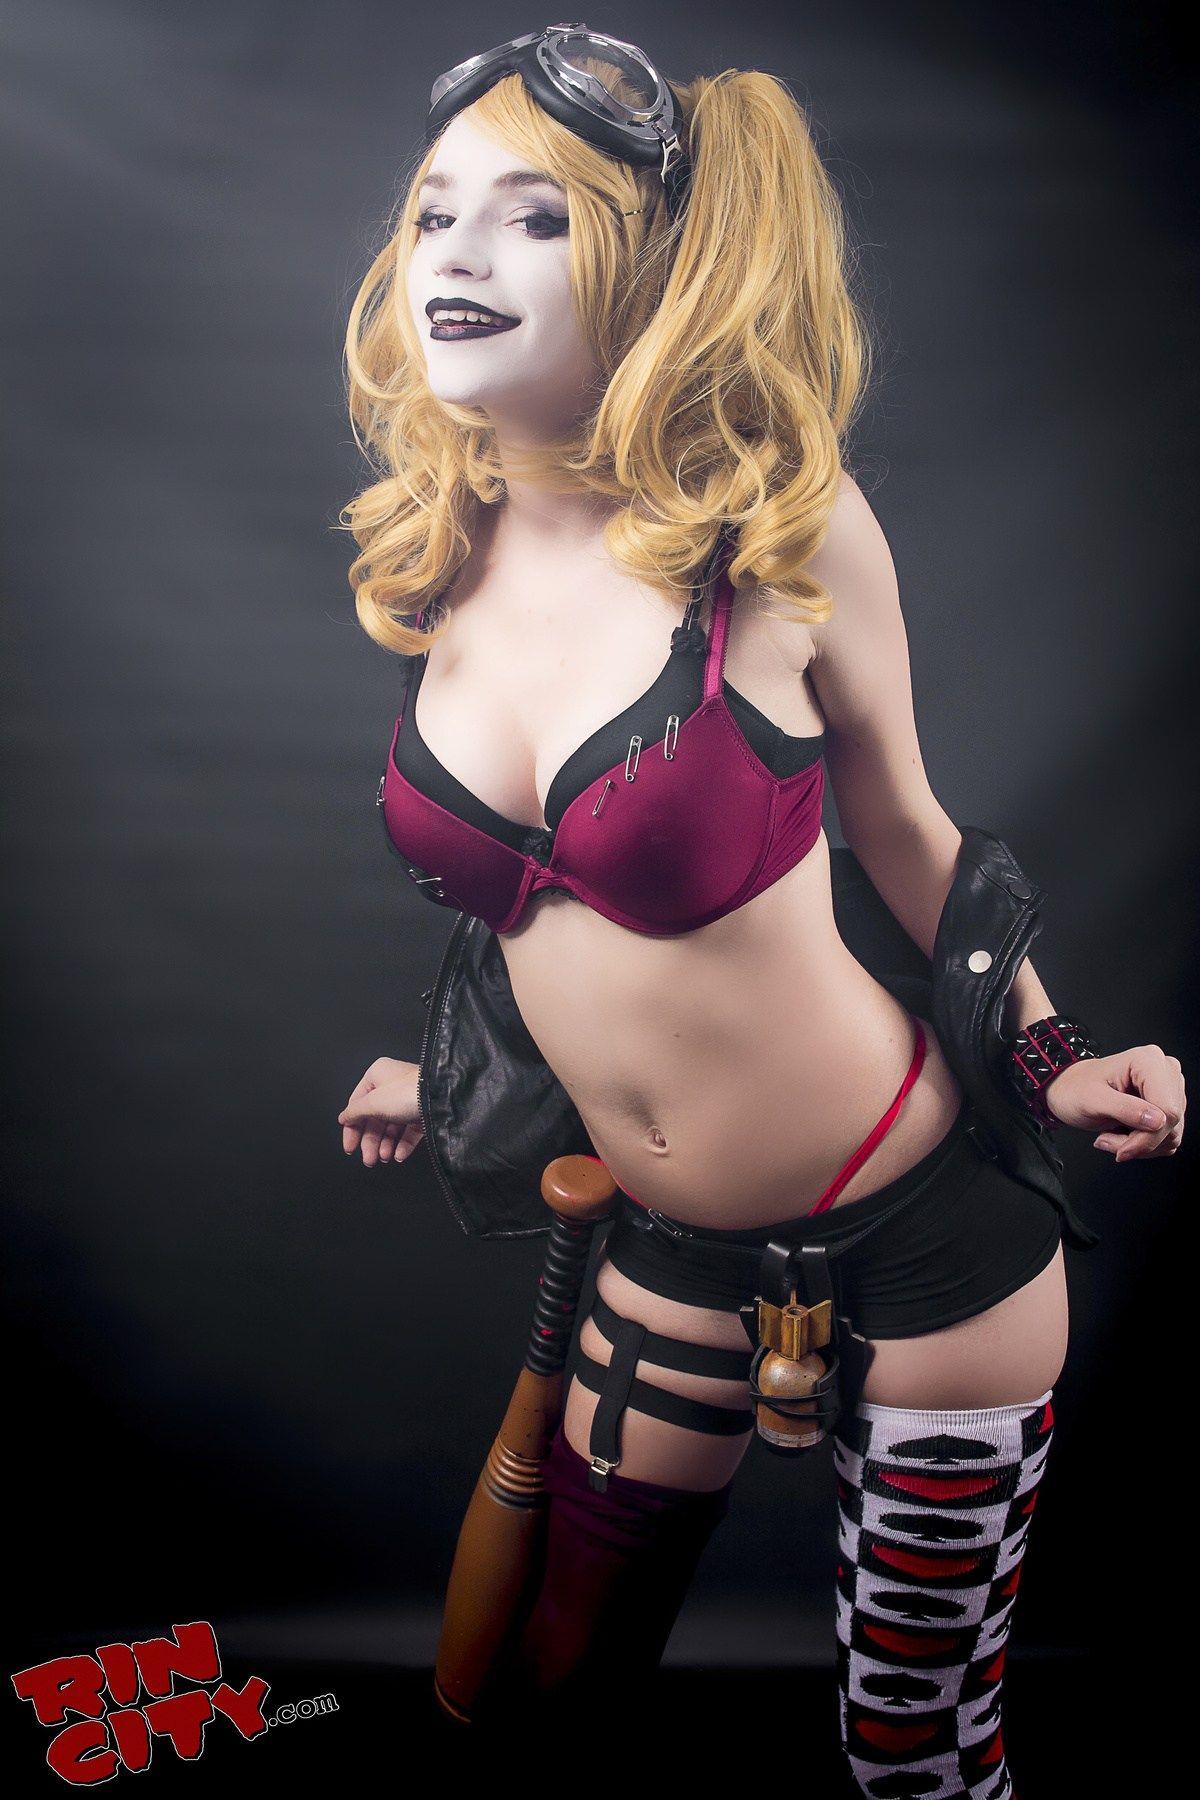 Harley quinn nude cosplay